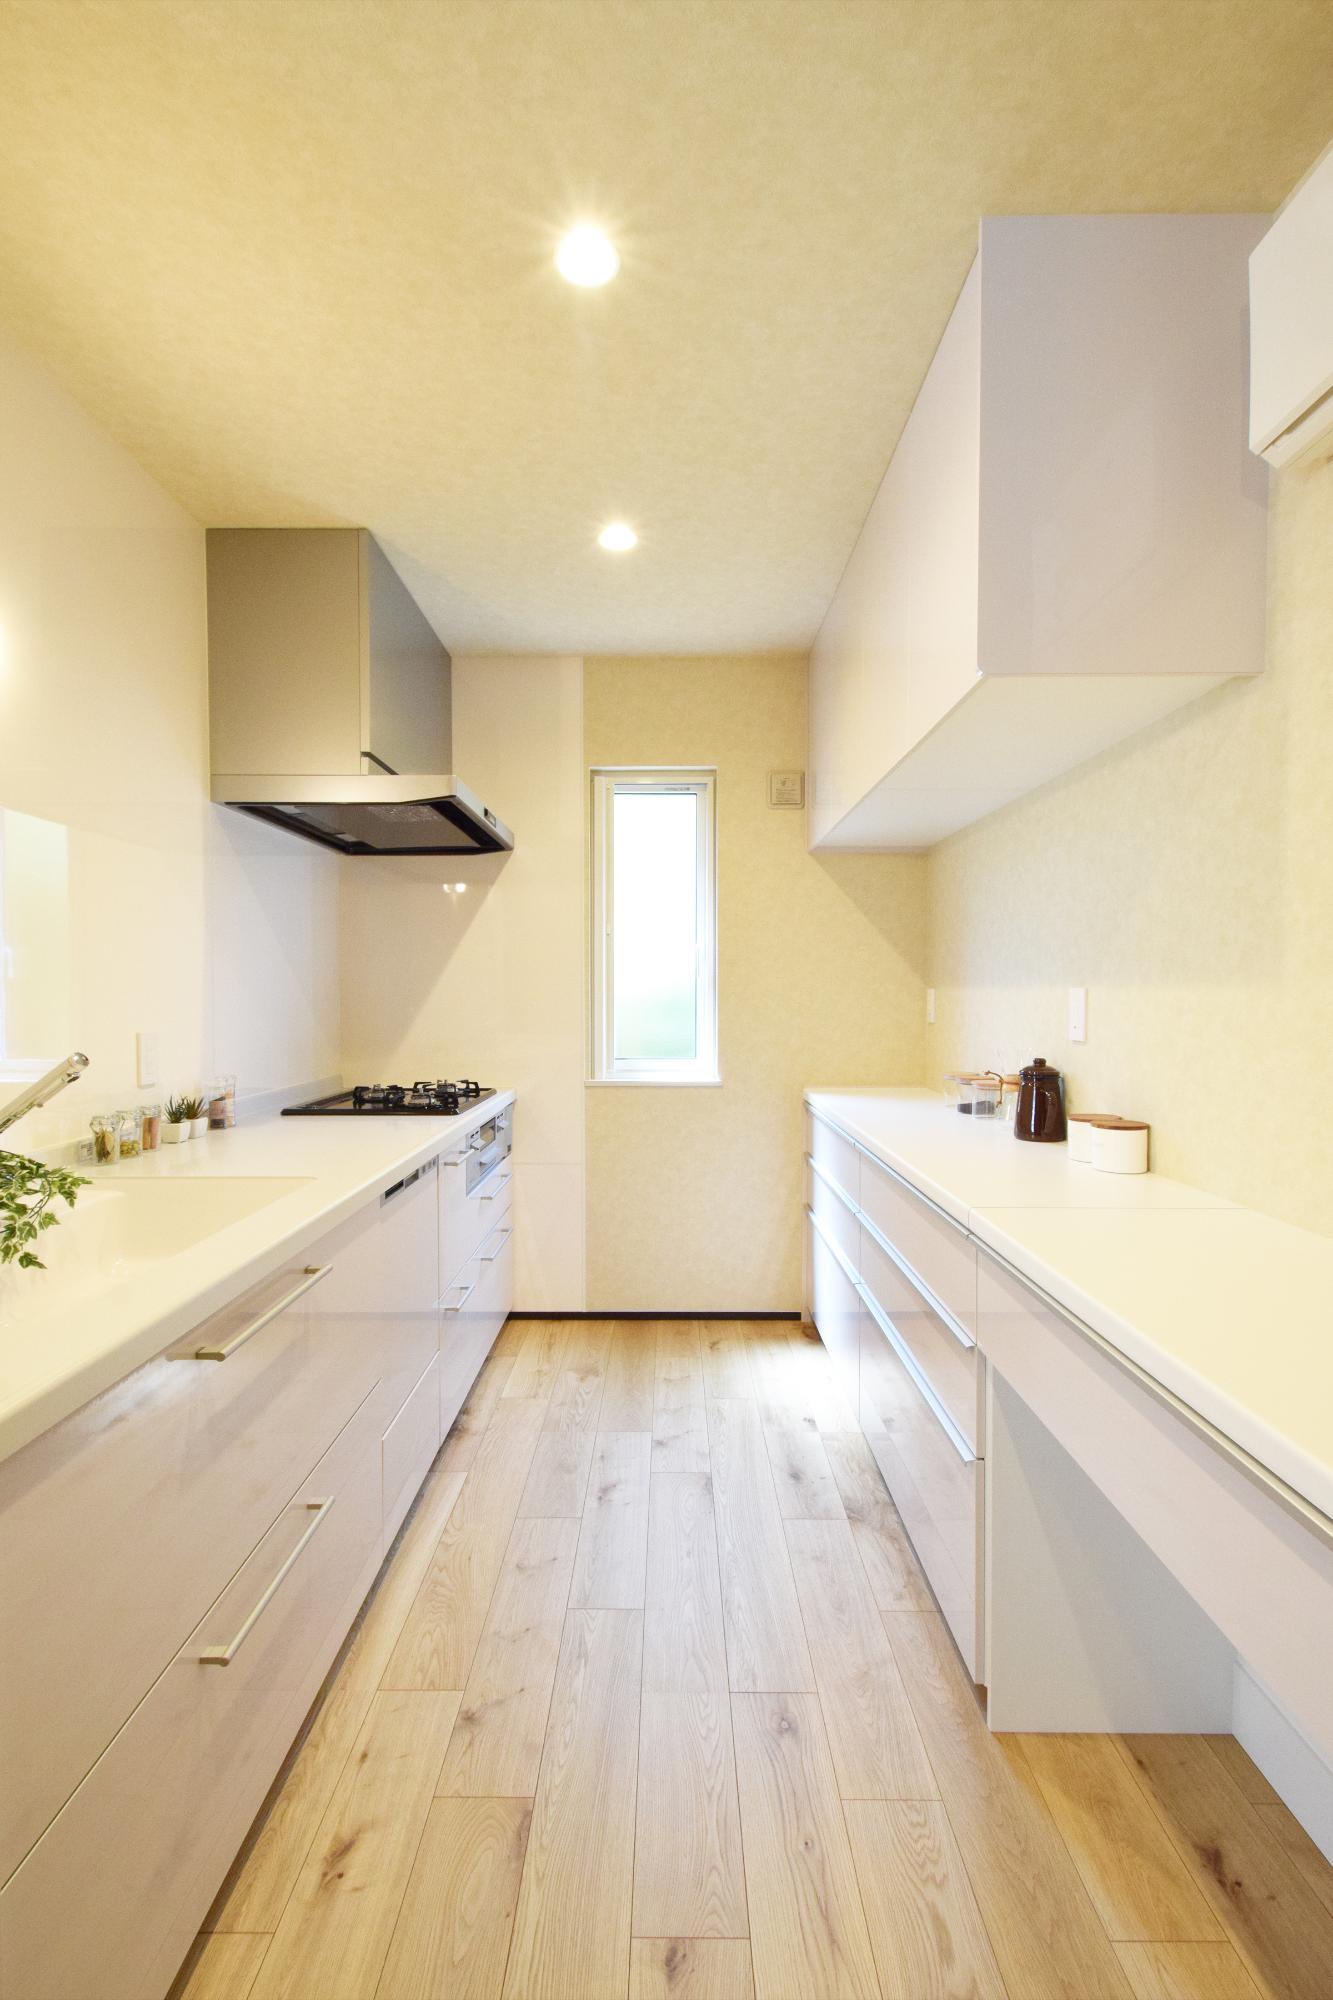 DETAIL HOME(ディテールホーム)「二世帯で住まう和モダン平屋住宅」のモダン・和風・和モダンなキッチンの実例写真